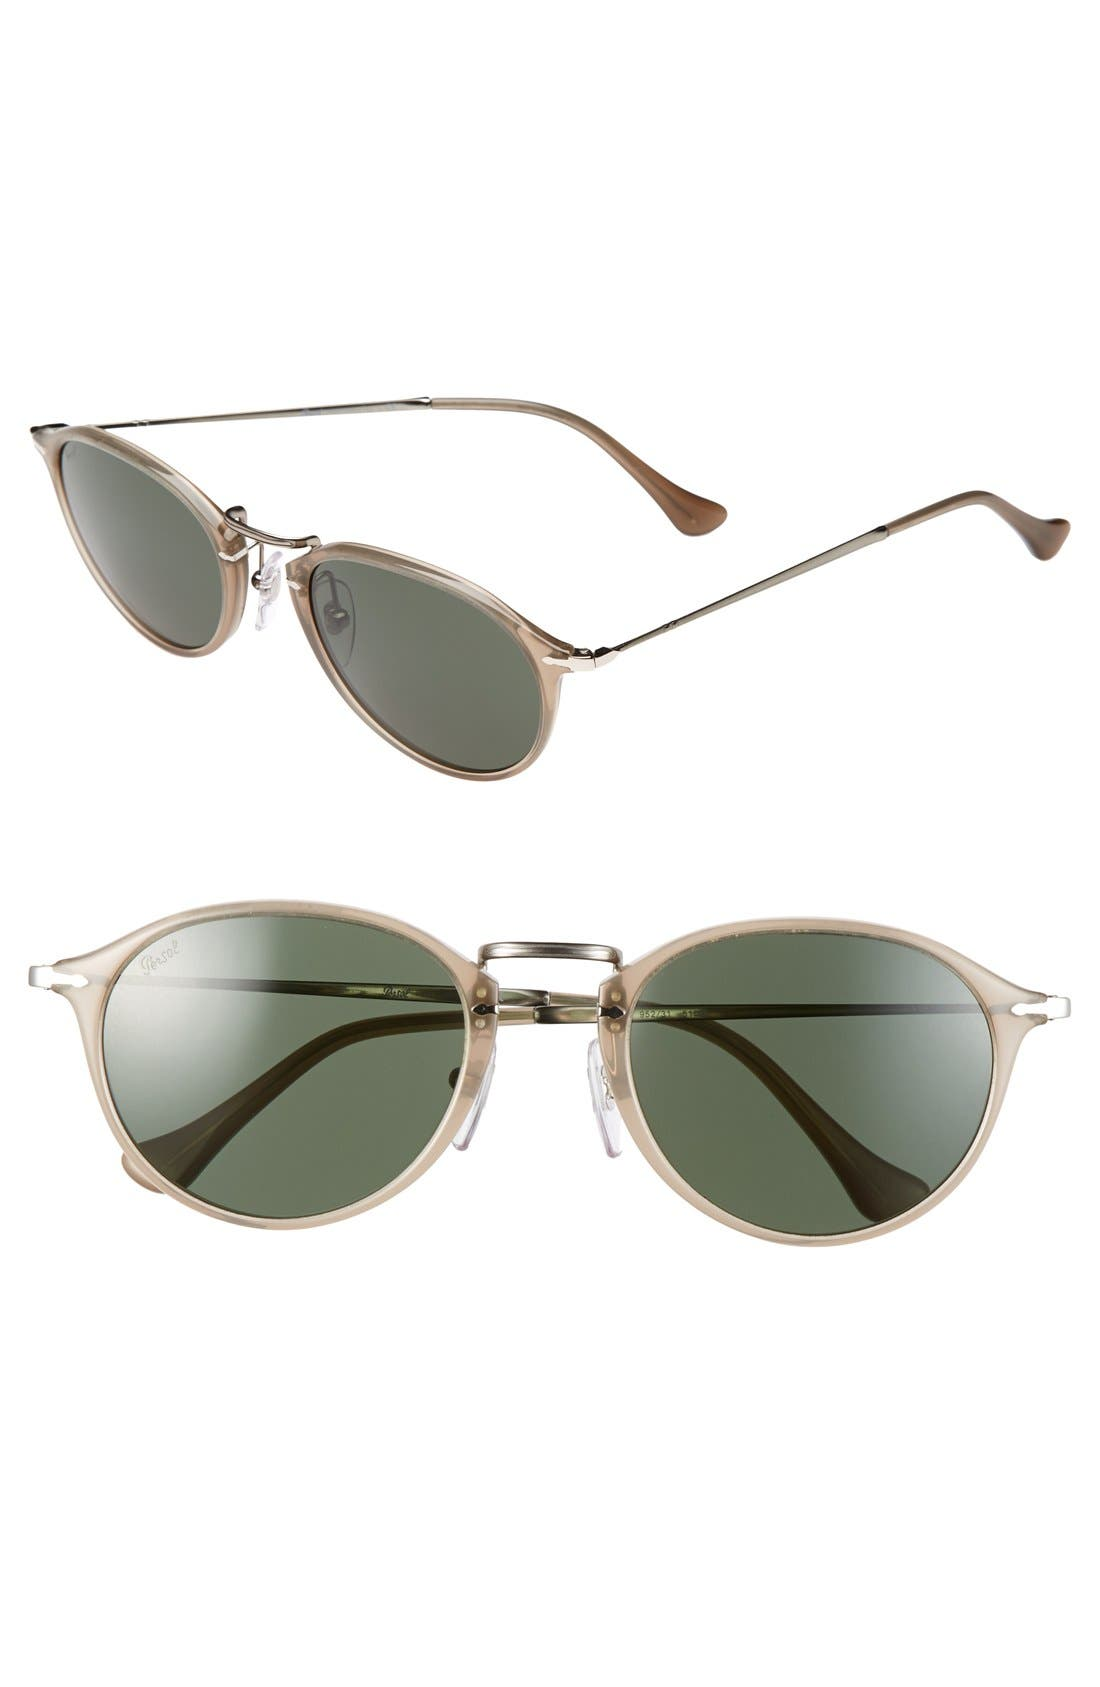 Main Image - Persol 51mm Defined Bridge Sunglasses